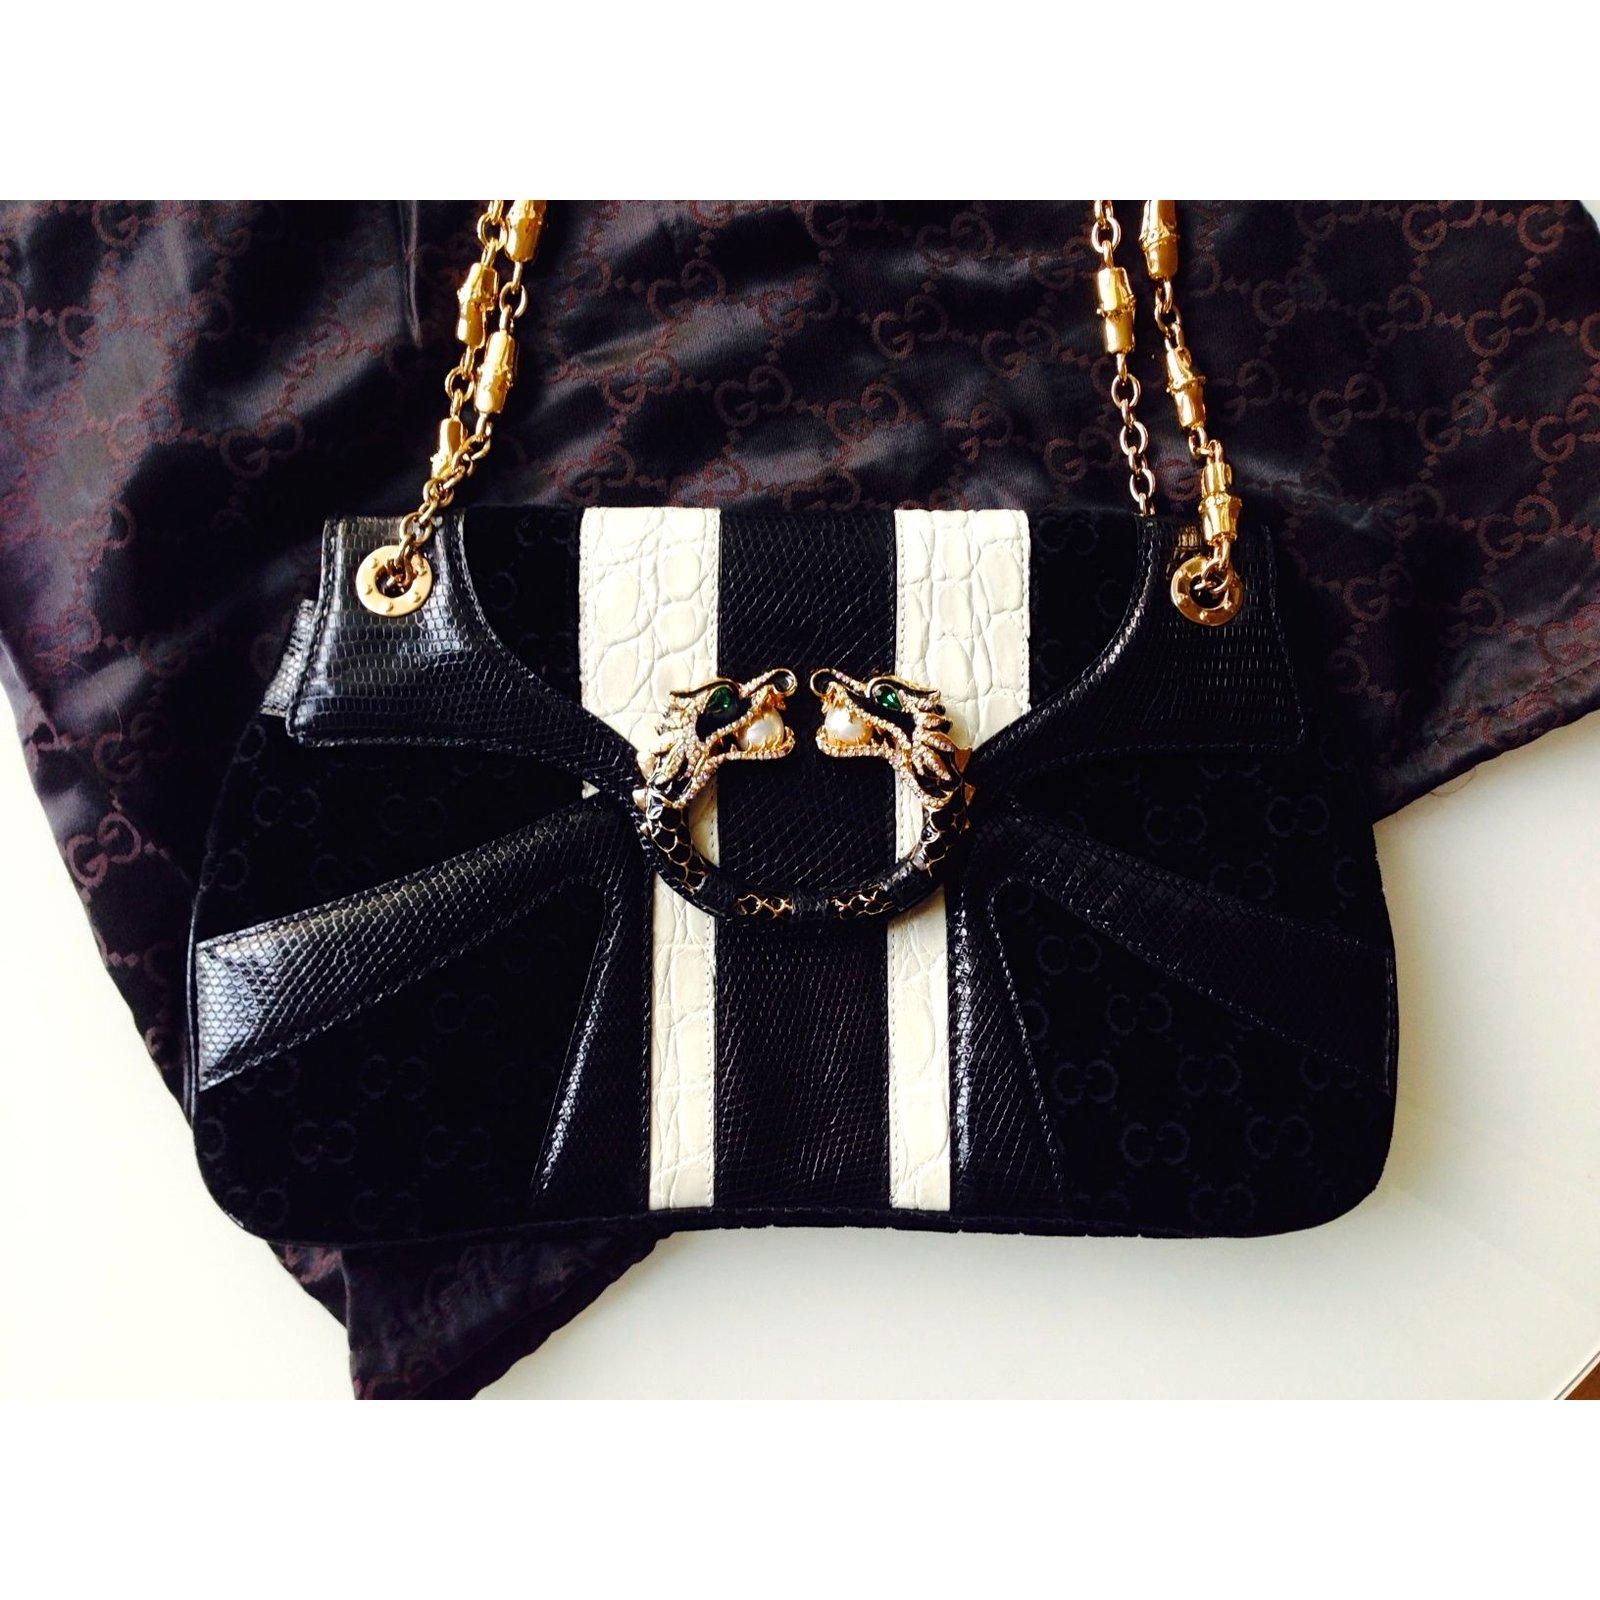 27baee324 Gucci Dragon Bag by Tom Ford Handbags Exotic leather Black ref.16666 - Joli  Closet